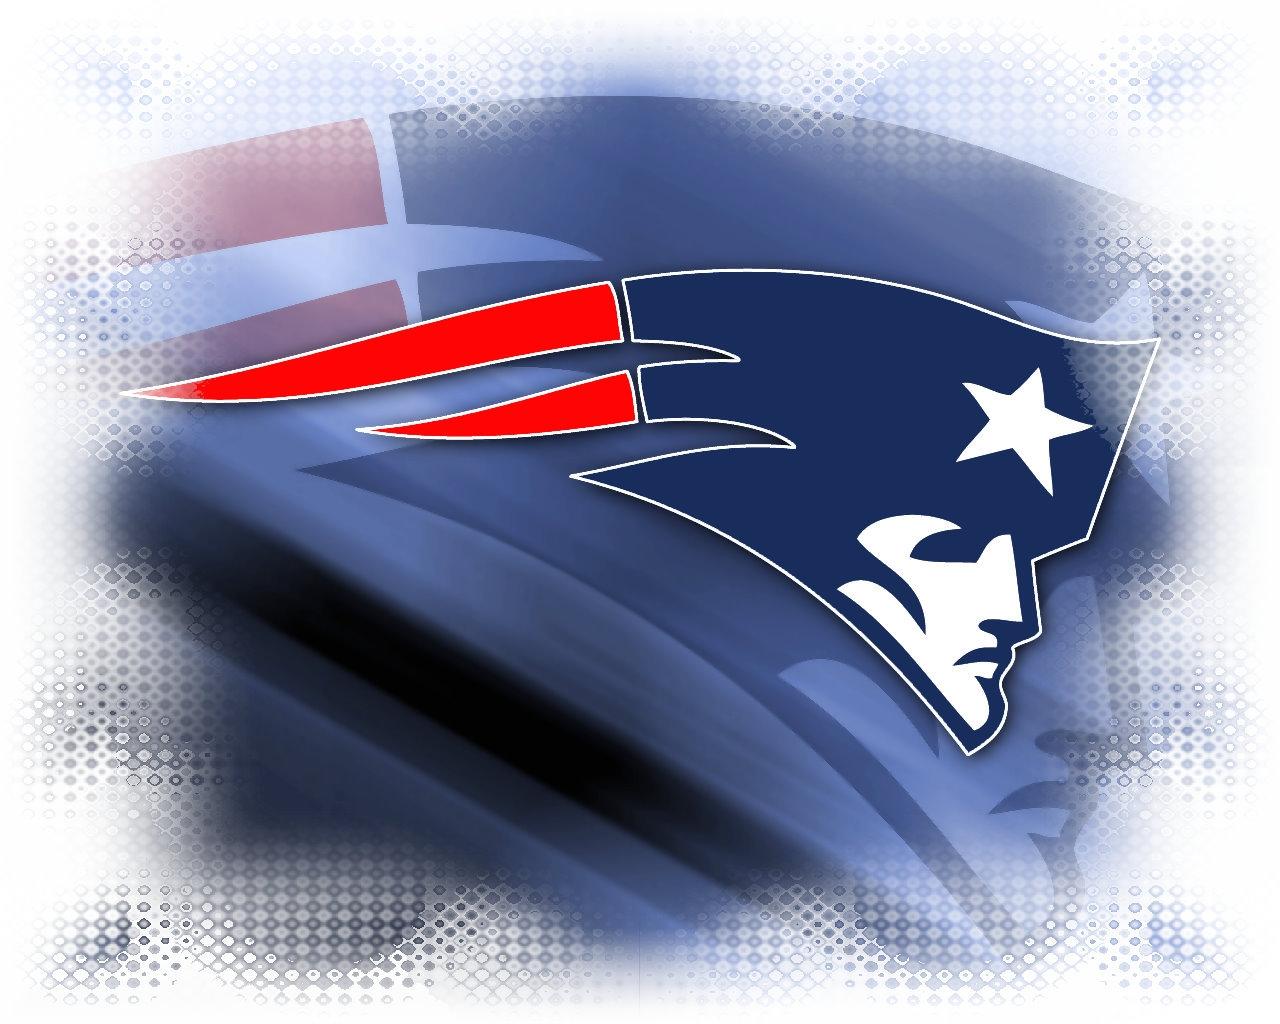 More New England Patriots wallpaper wallpapers New England Patriots 1280x1024